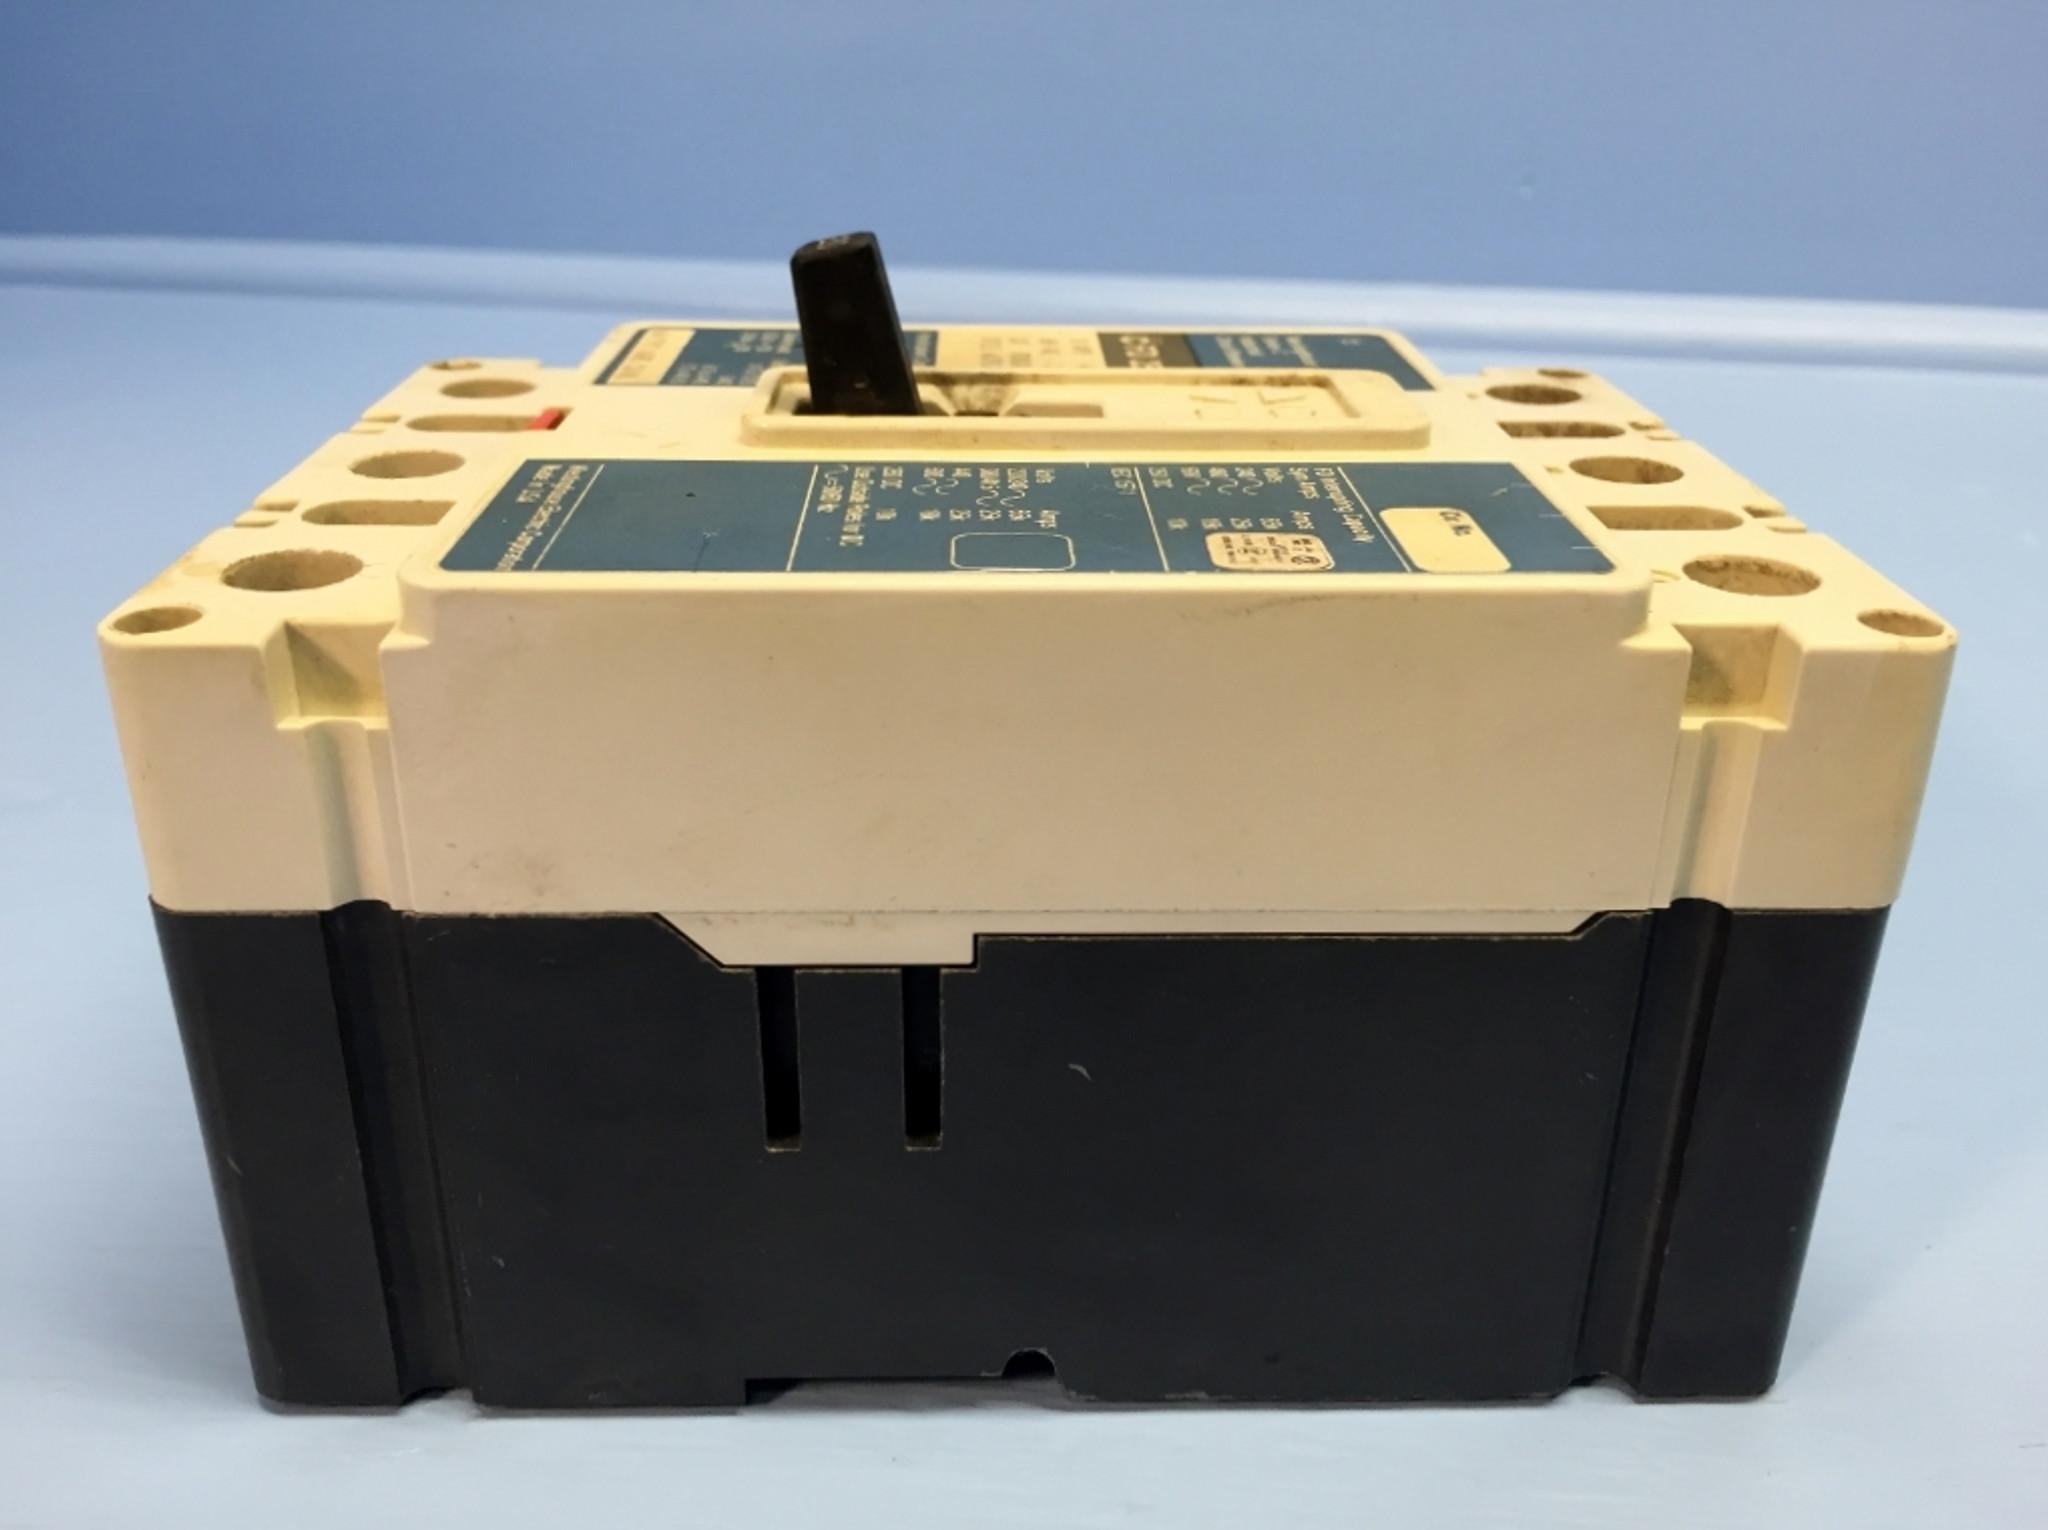 Circuit Breakers Cutler-hammer C-H Westinghouse FDC3020 Eaton